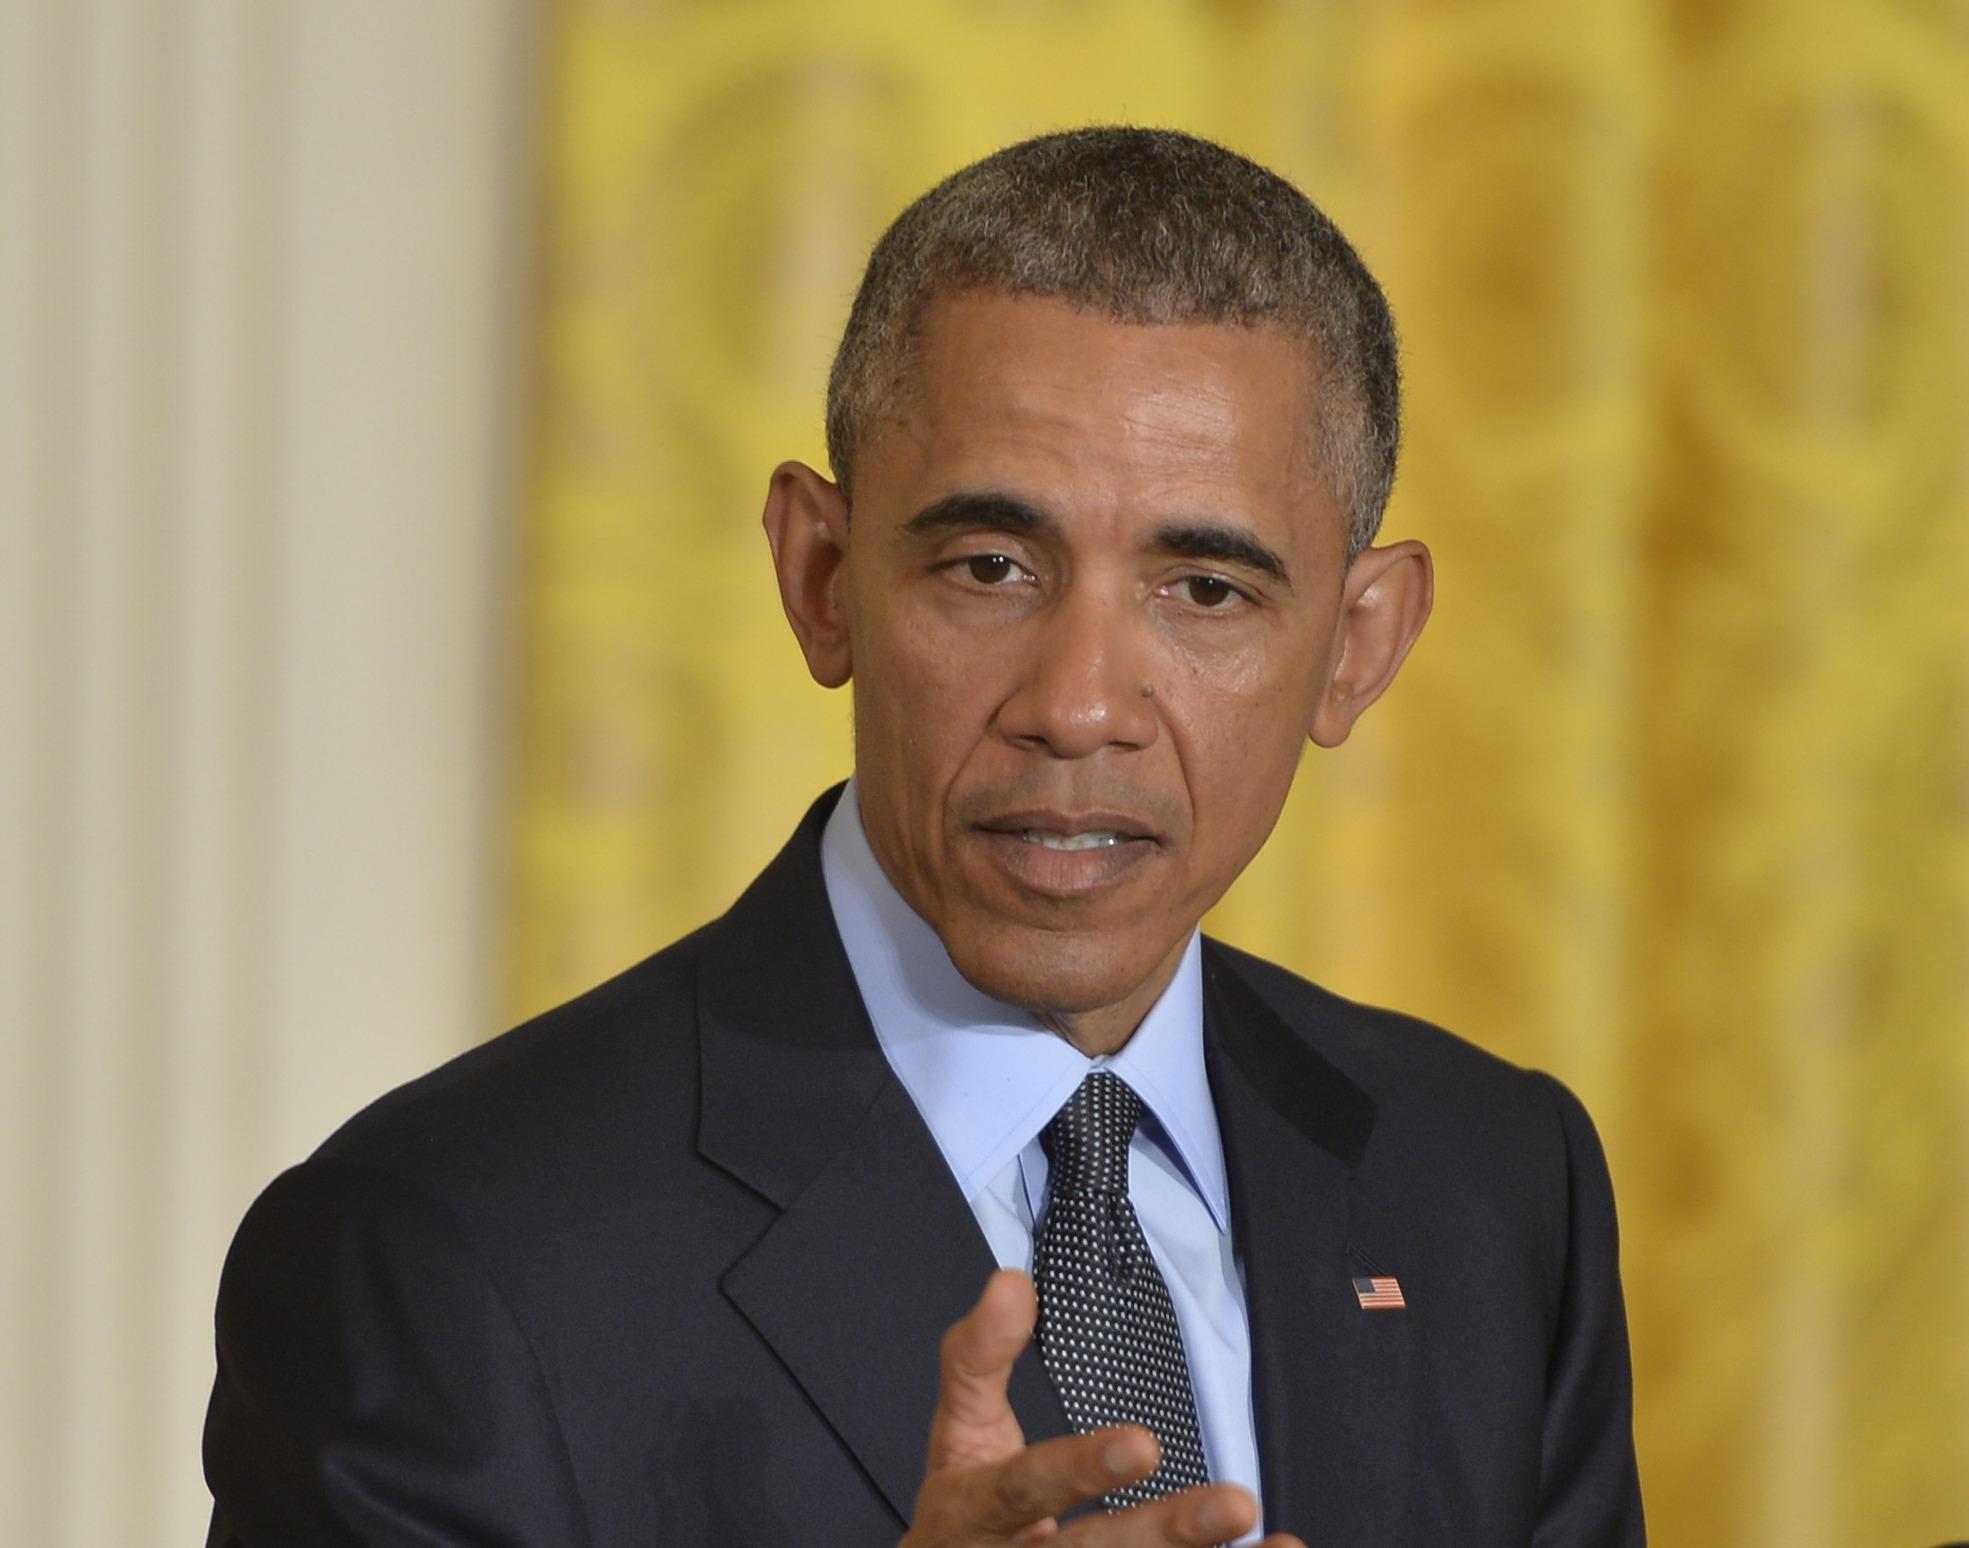 I'm Best Suited As Basketball Commissioner: Obama